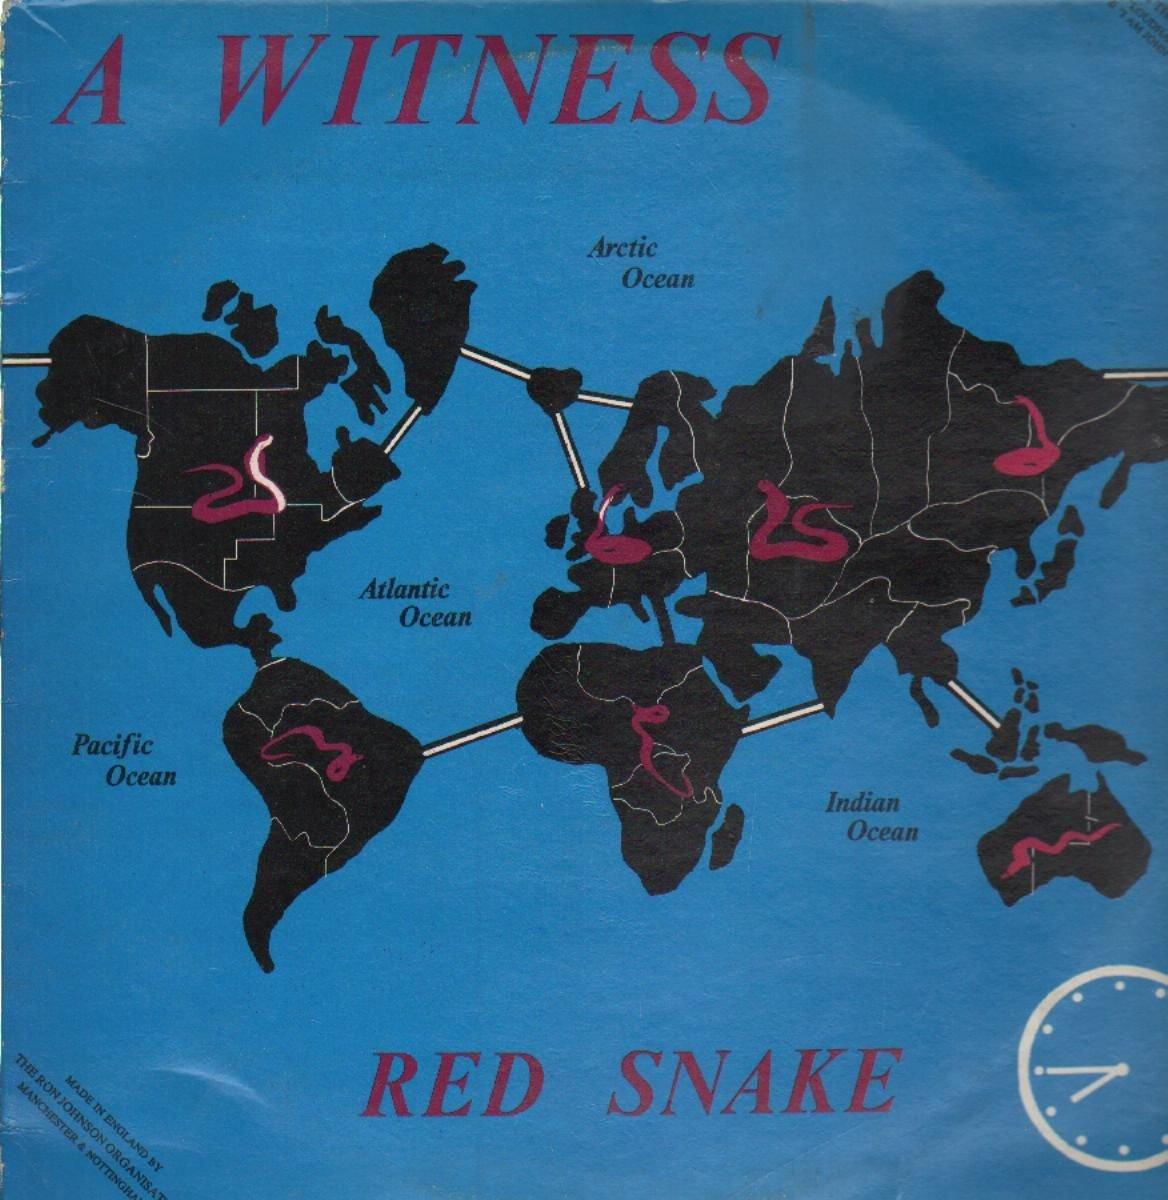 Red Snake: A Witness, A Witness: Amazon.es: Música